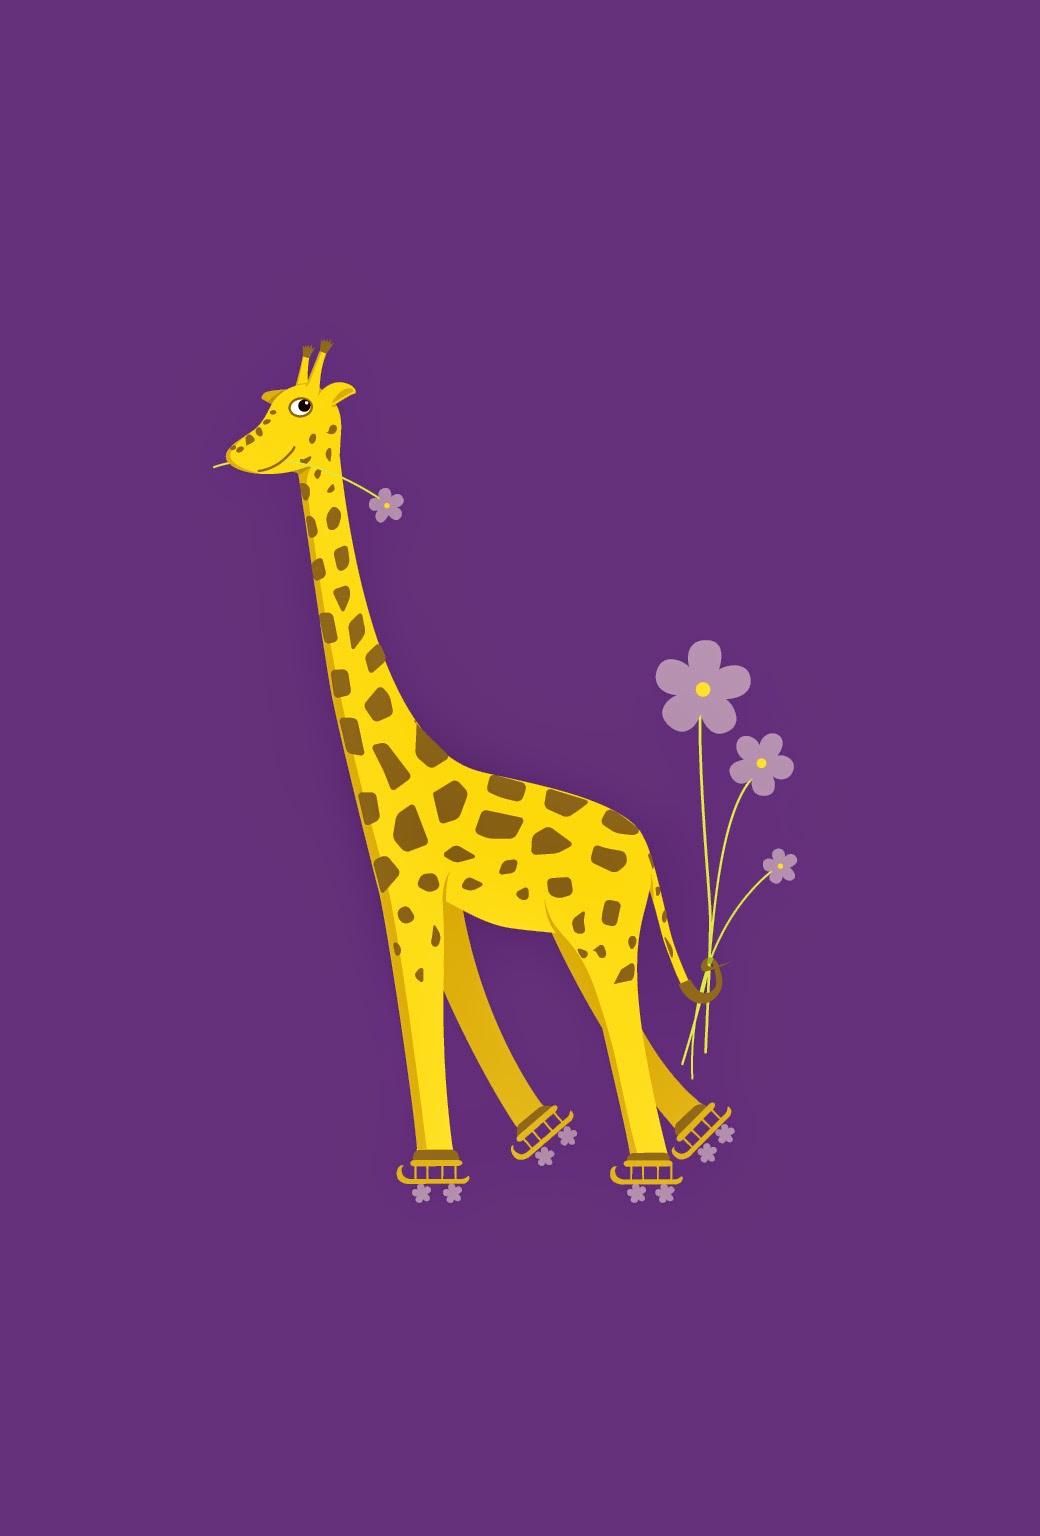 Cute Giraffe Wallpapers WallpaperPulse